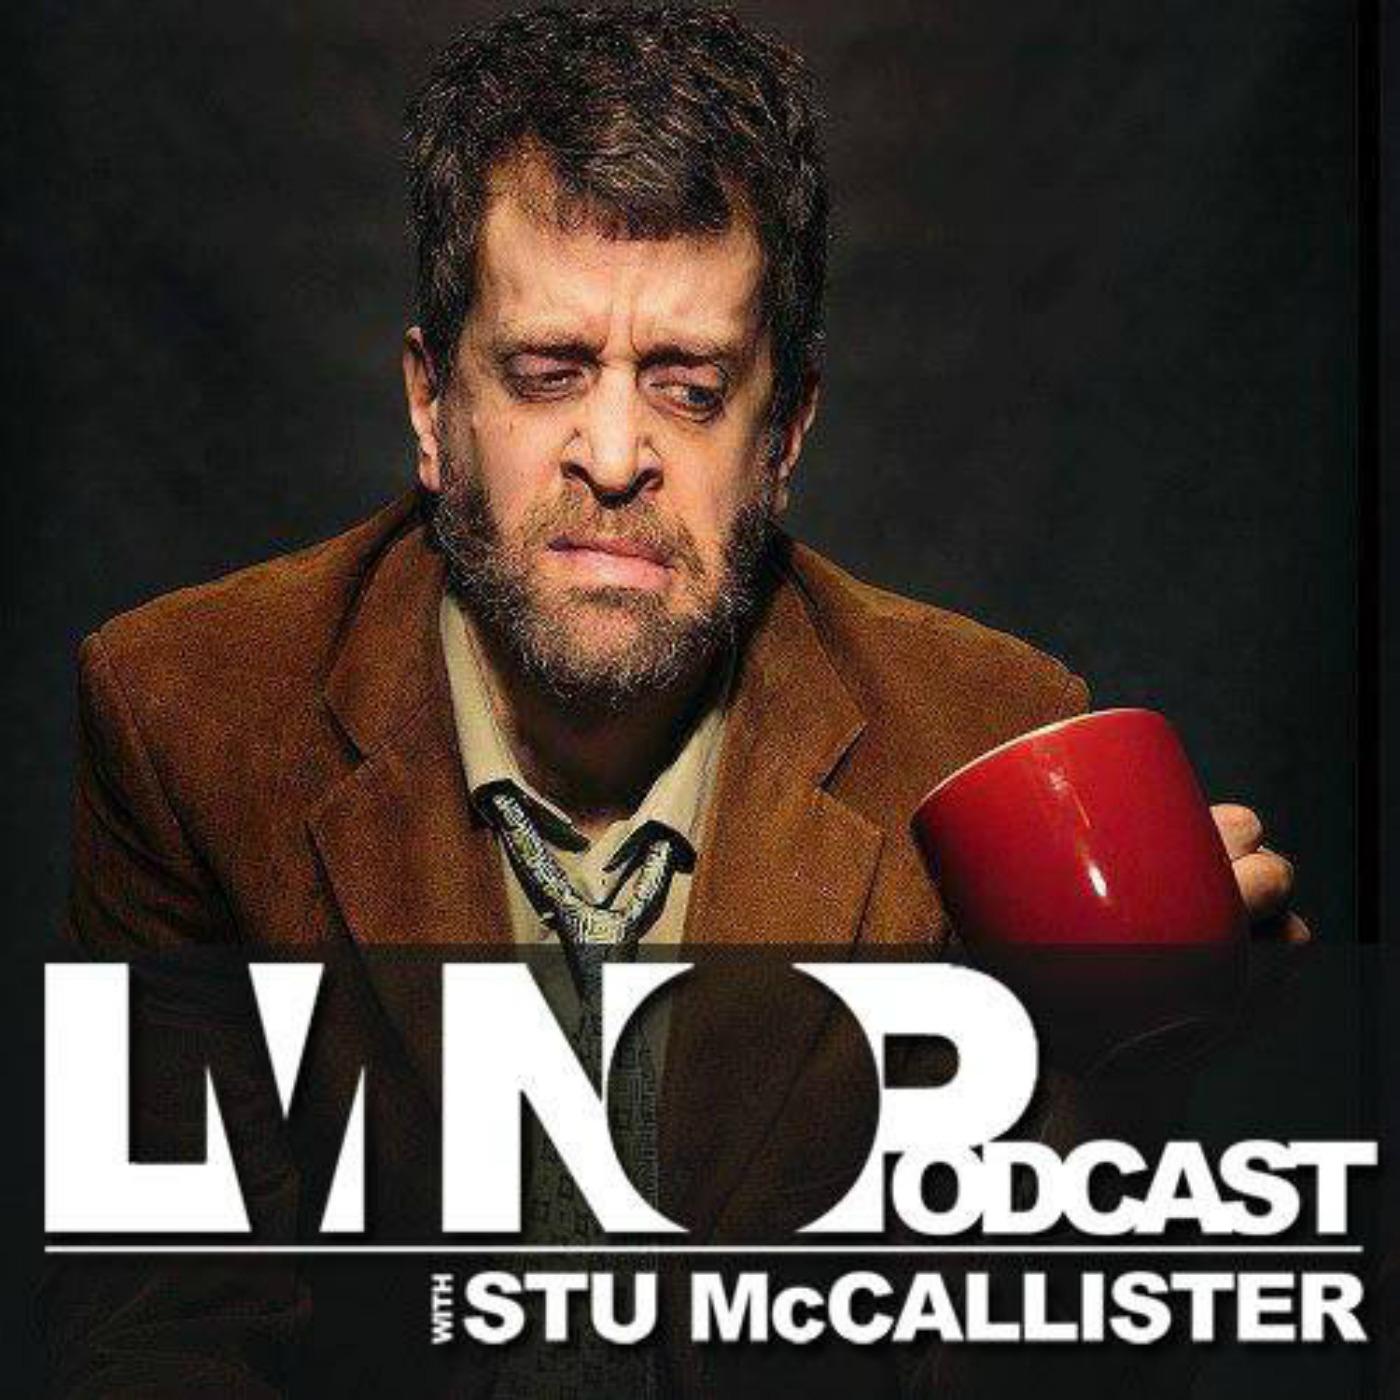 LMNOPodcast